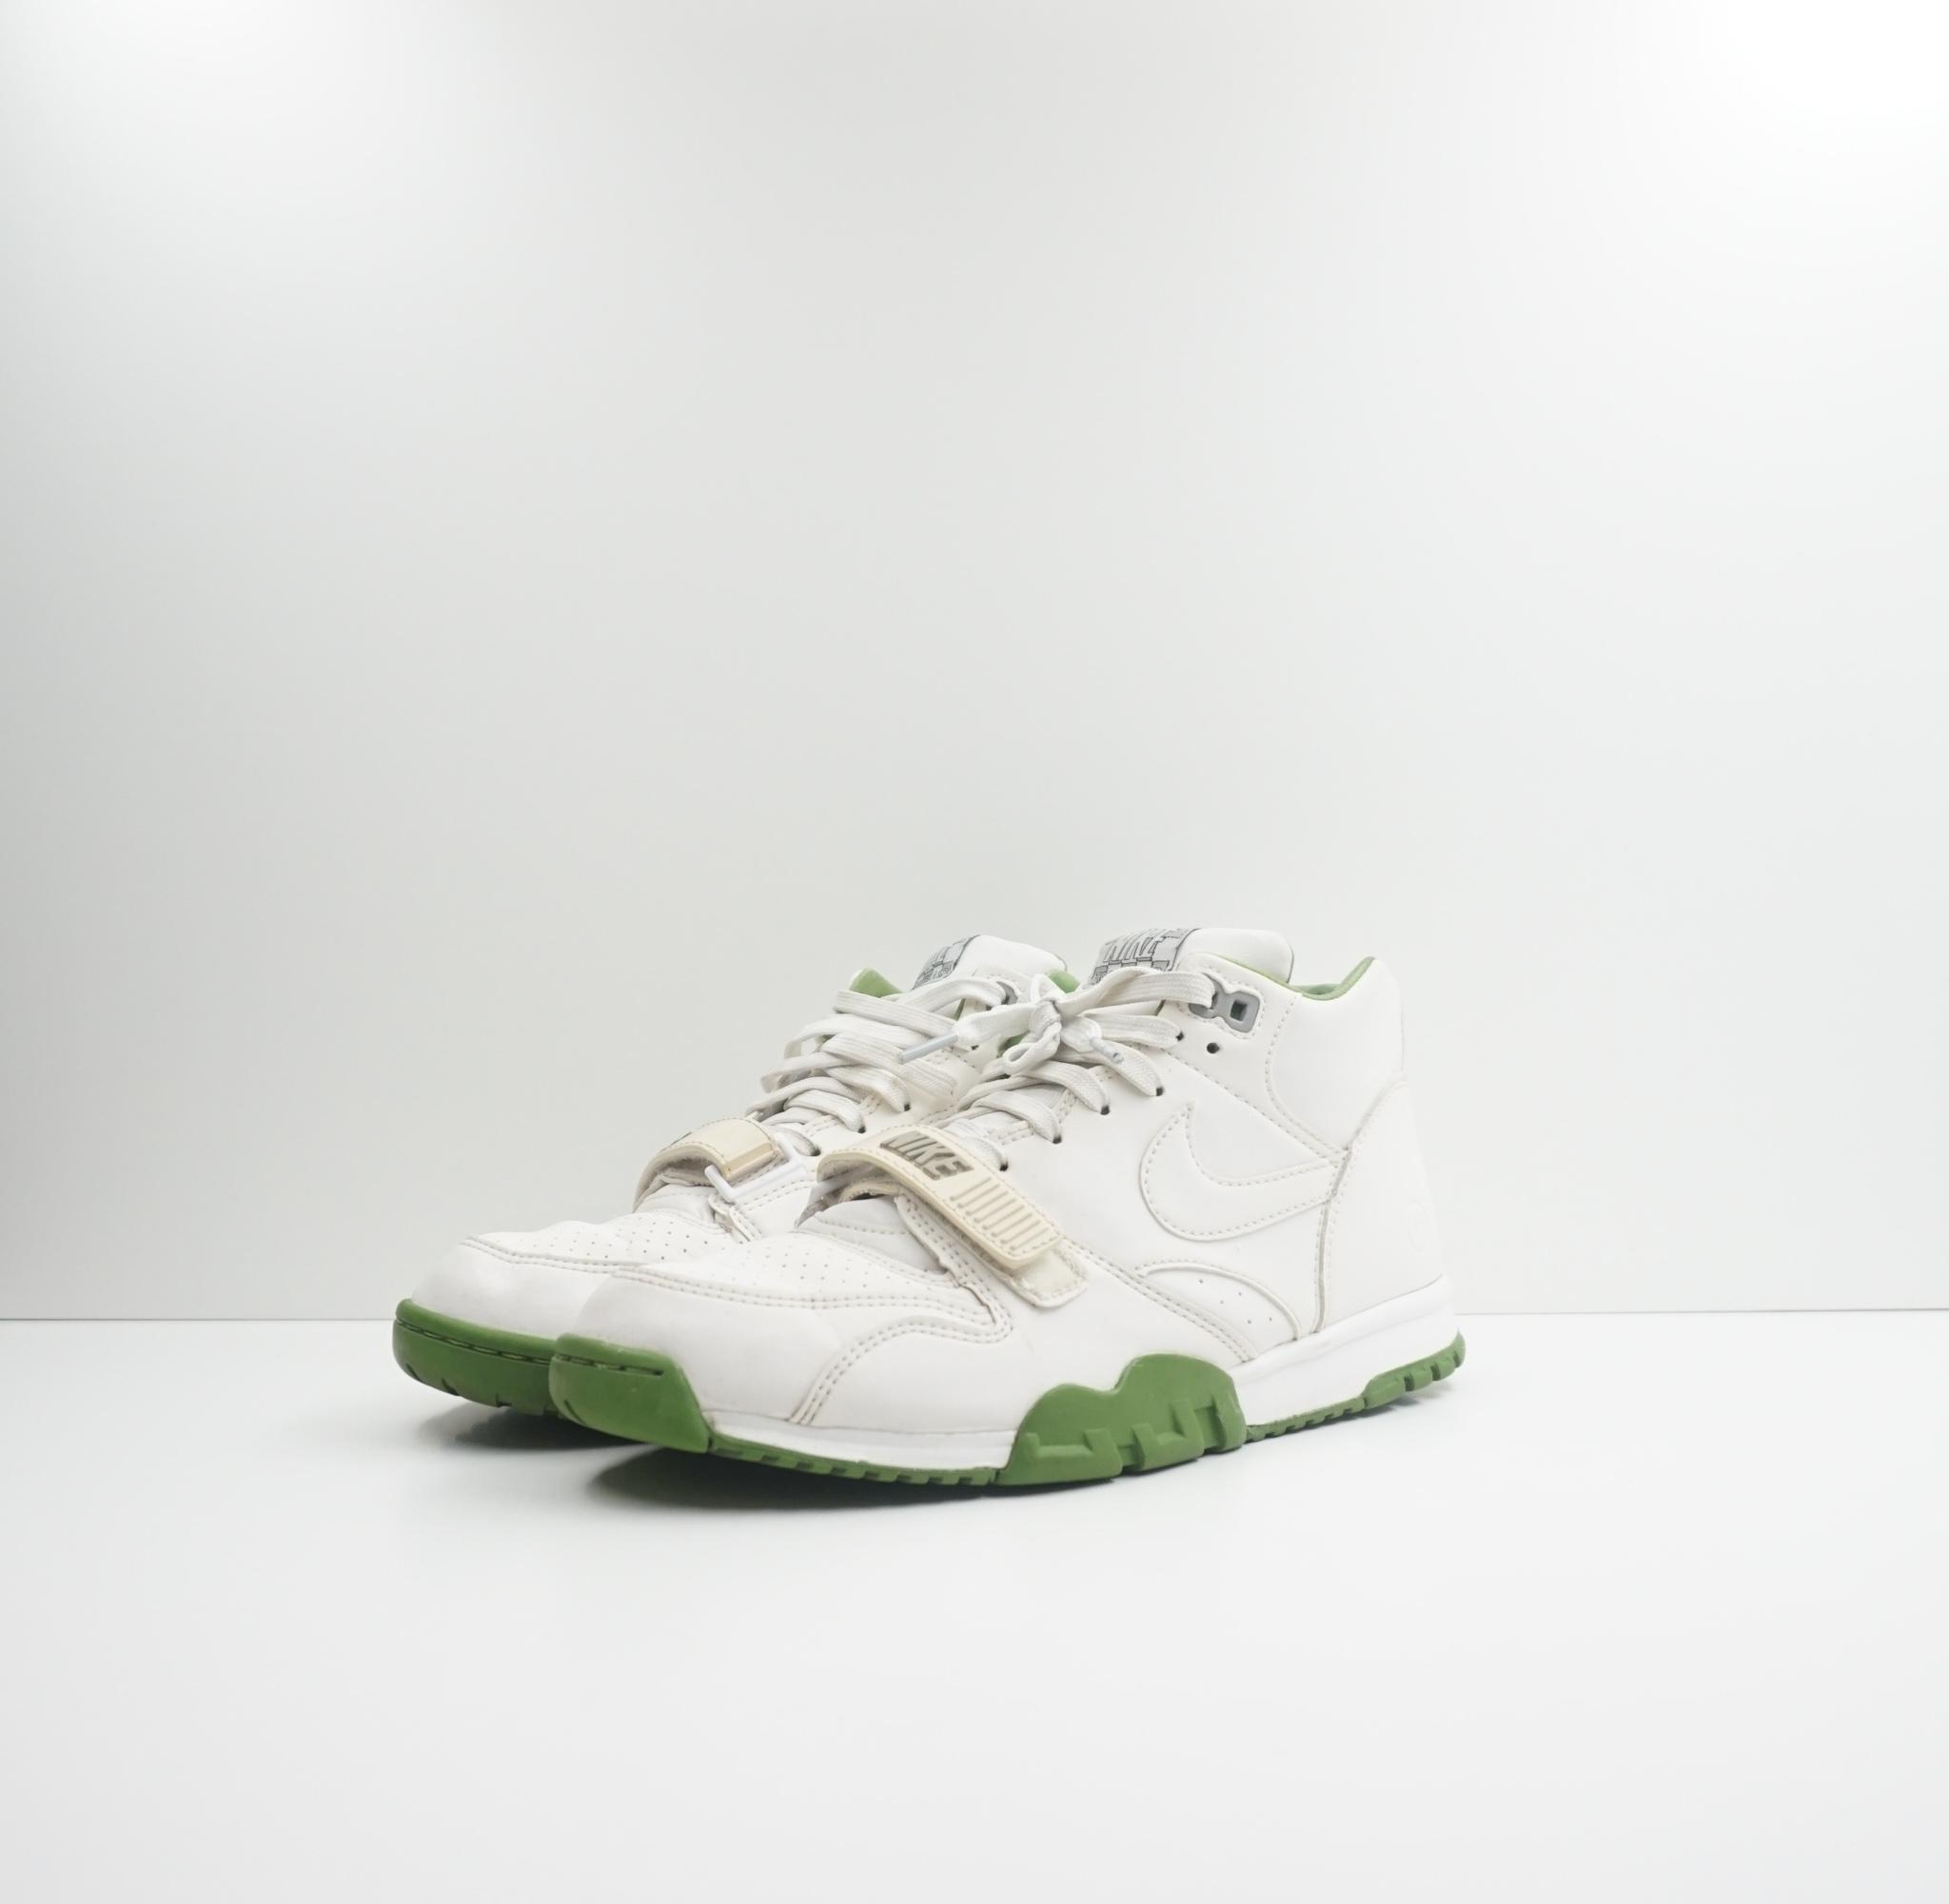 Nike Fragment Design x Air Trainer 1 Mid SP White Chlorophyll